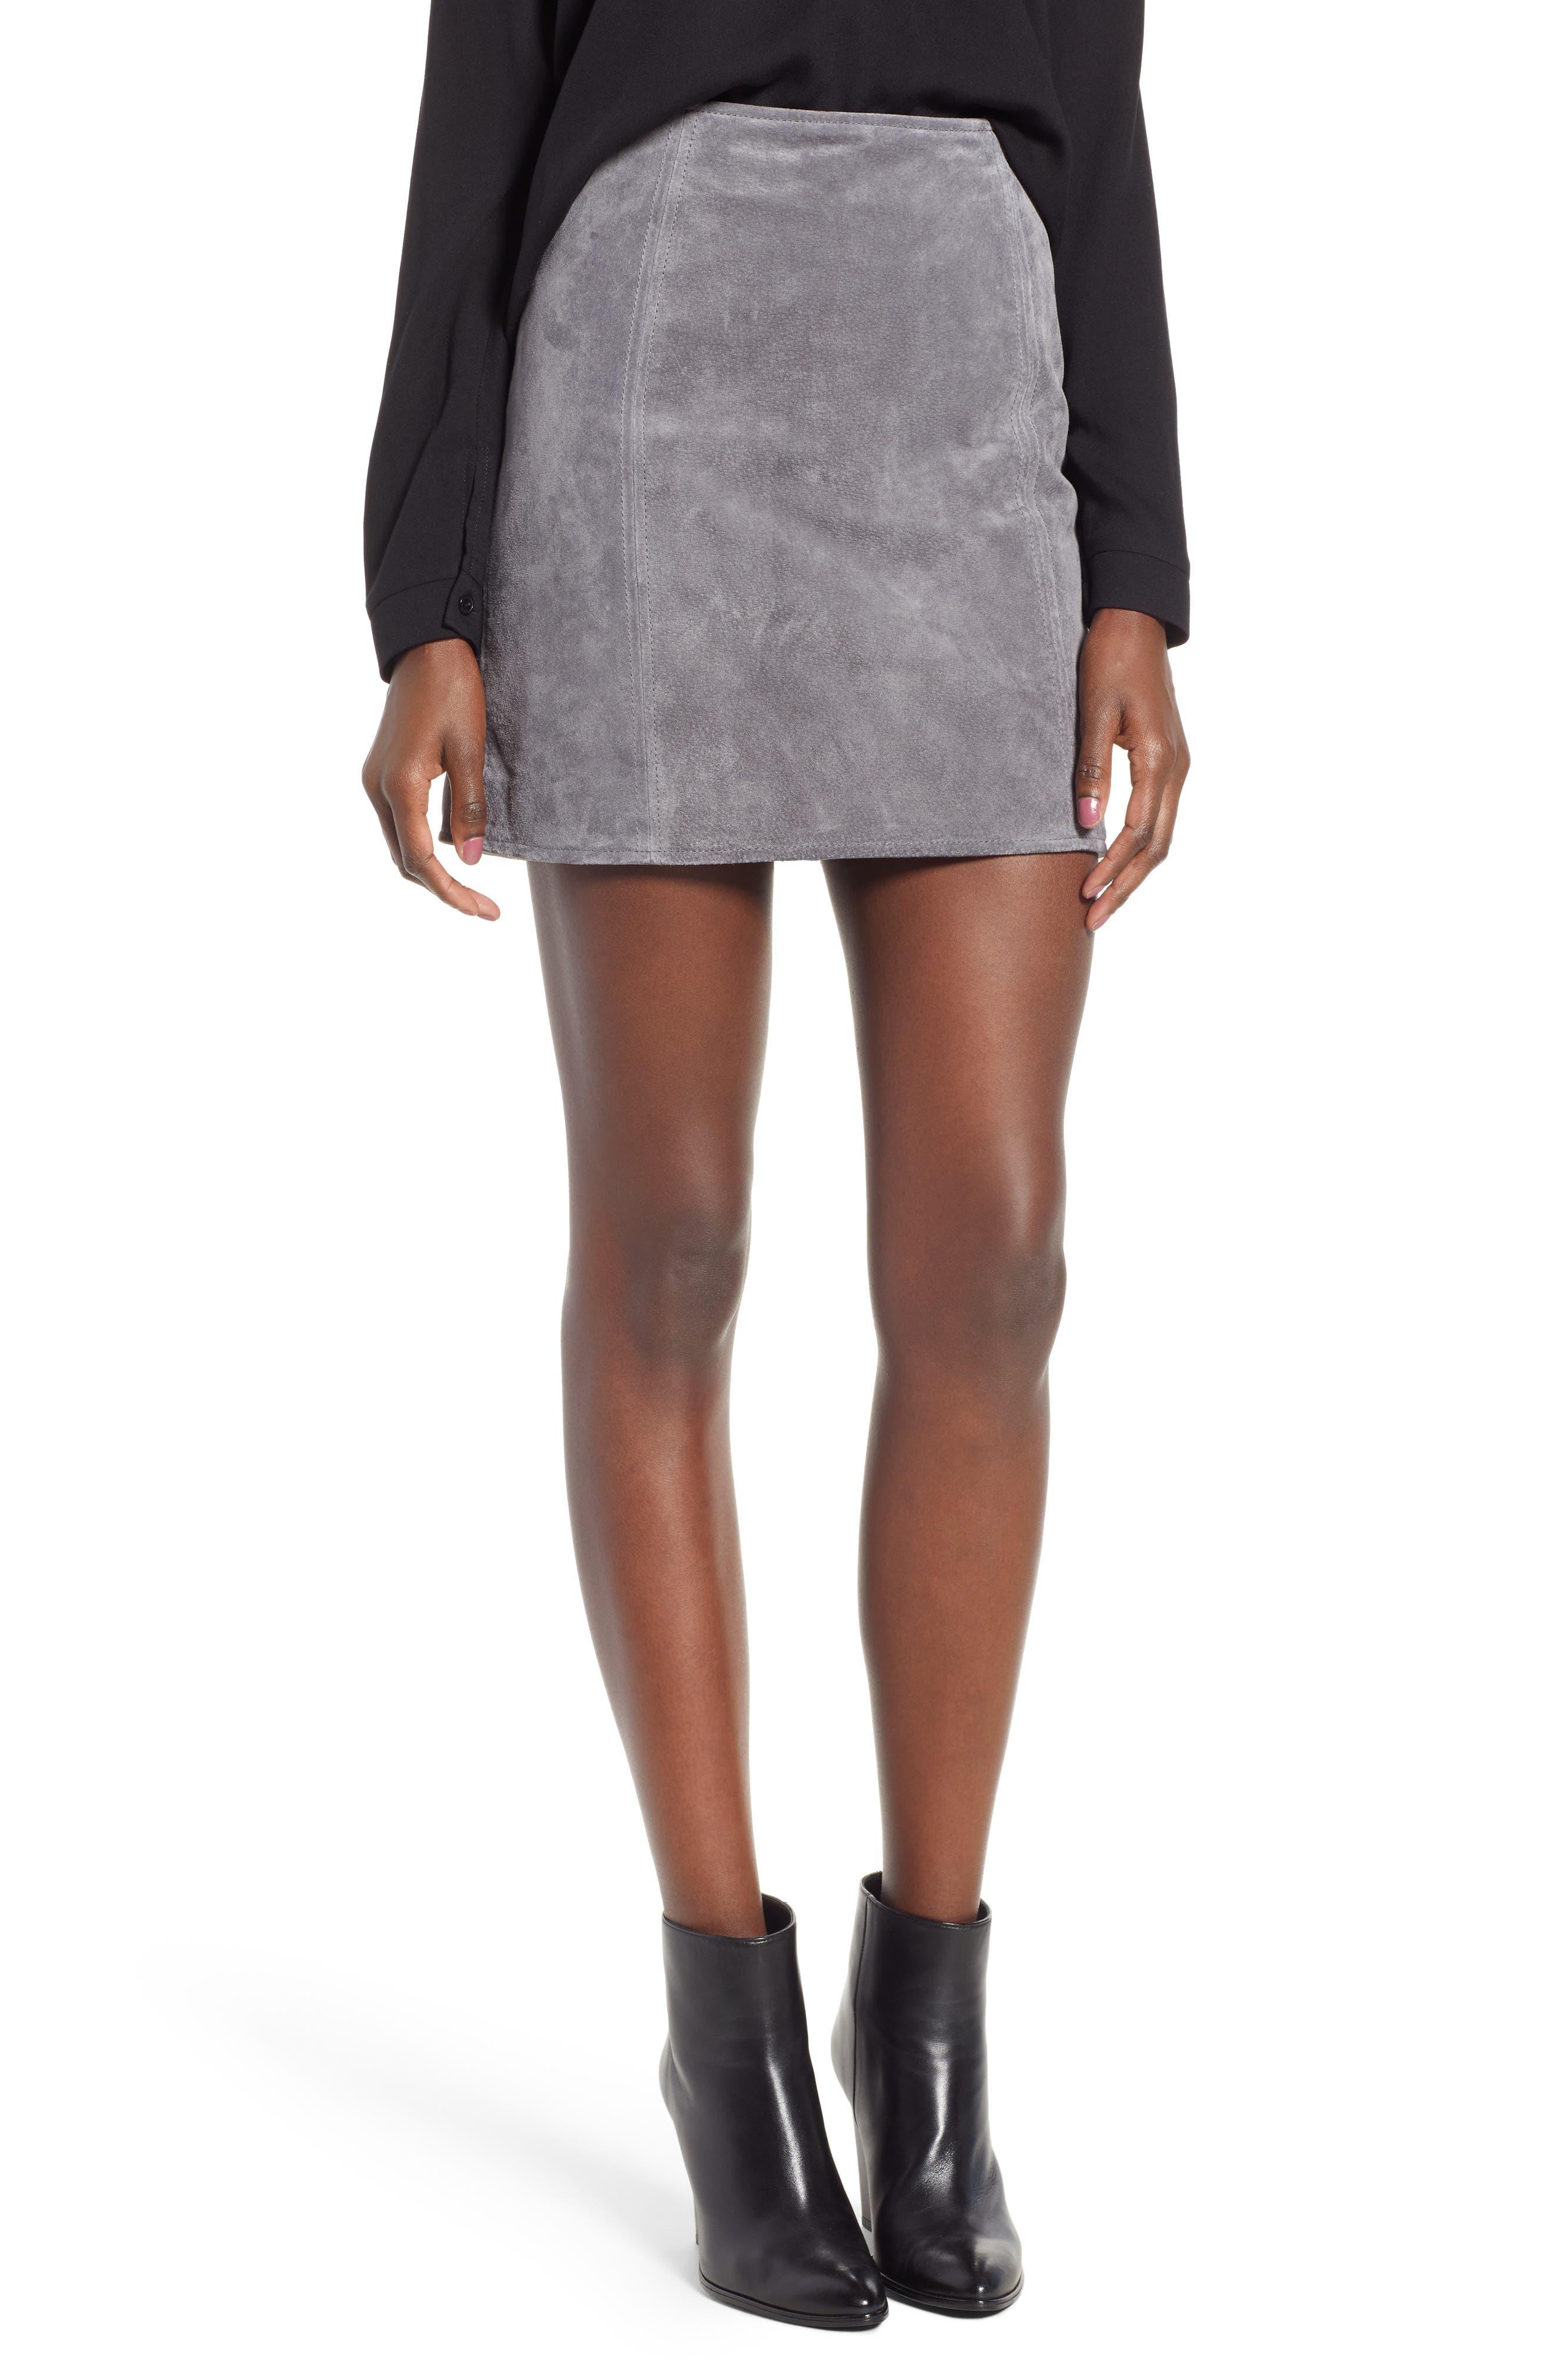 Blanknyc A-Line Suede Skirt, 7 - Grey